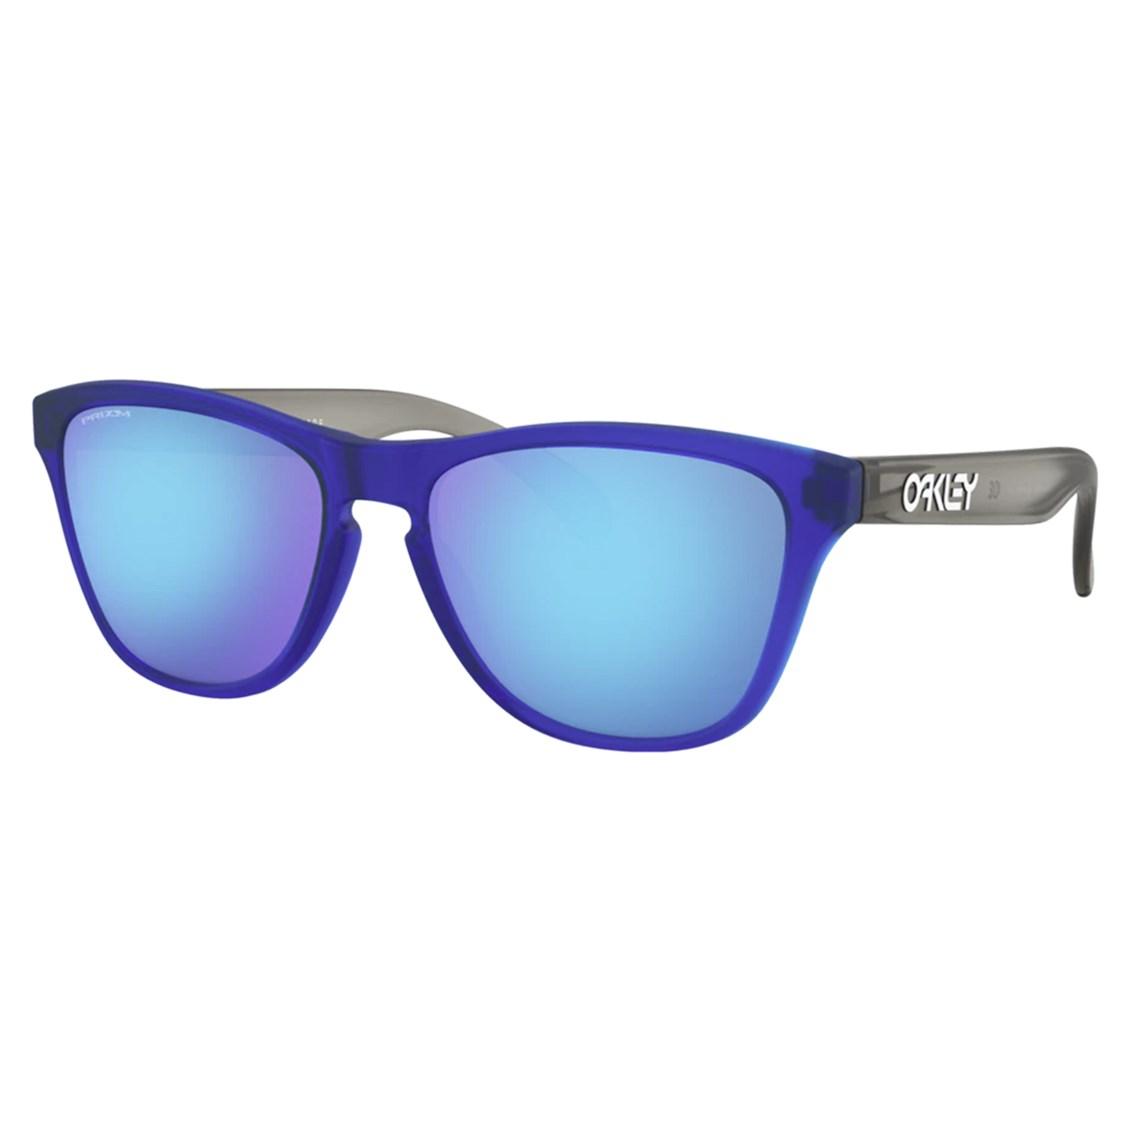 Óculos de Sol Oakley Frogskins Xs Matte Translucent Sapphire OJ9006 12-53